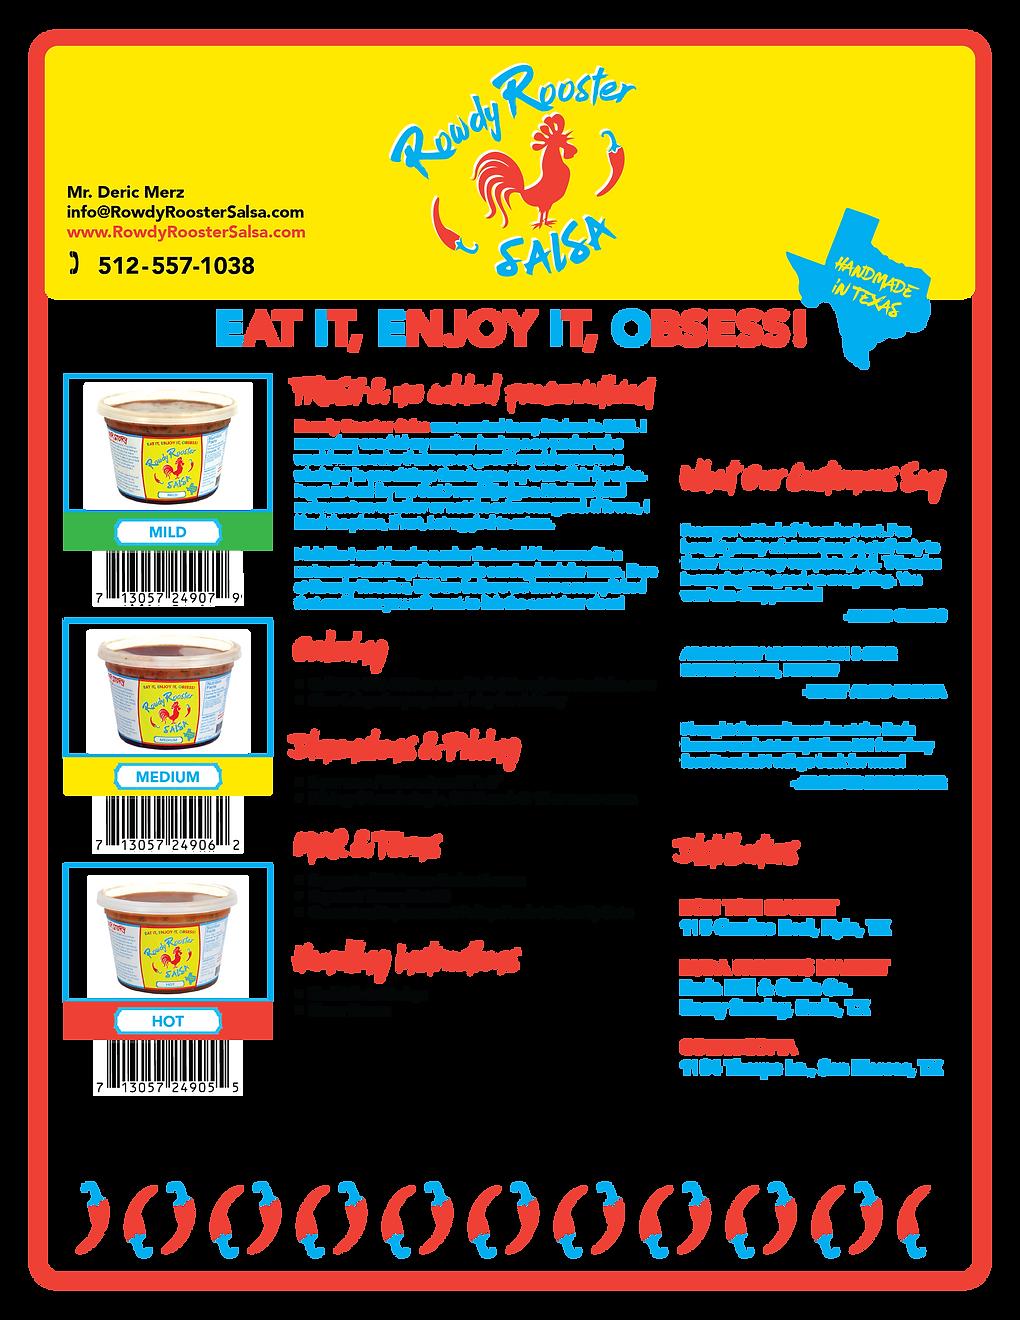 NutritionArtboard 1.png